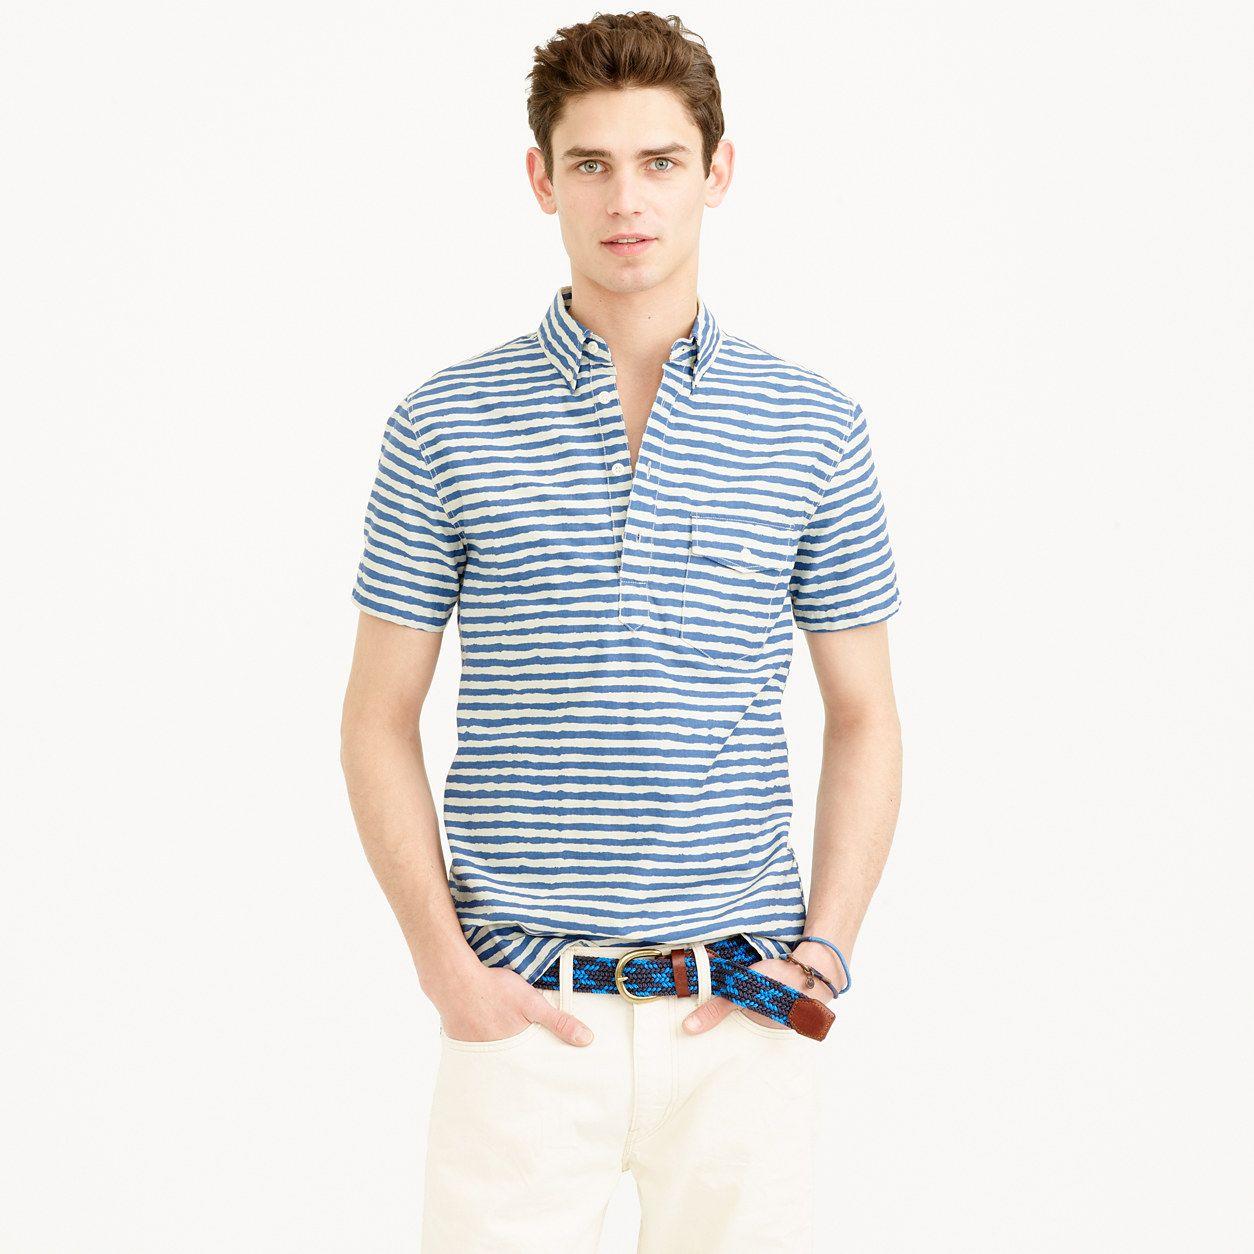 4443ff90c793 Short-sleeve cotton shirt in shibori print : shirts | J.Crew ...